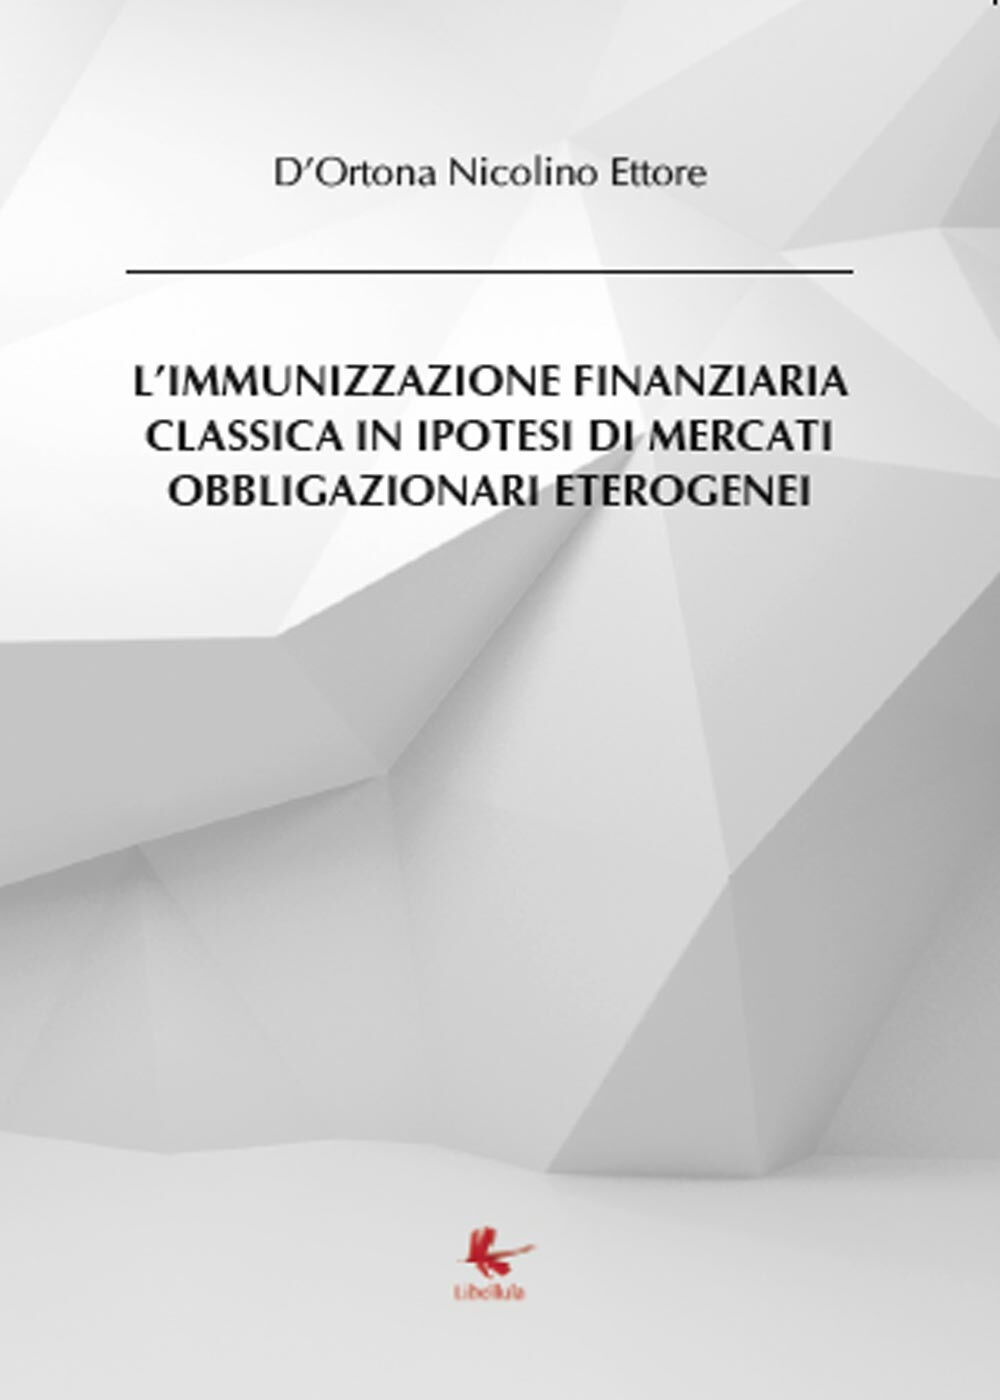 L' immunizzazione finanziaria classica in ipotesi di mercati obbligazionari eterogenei